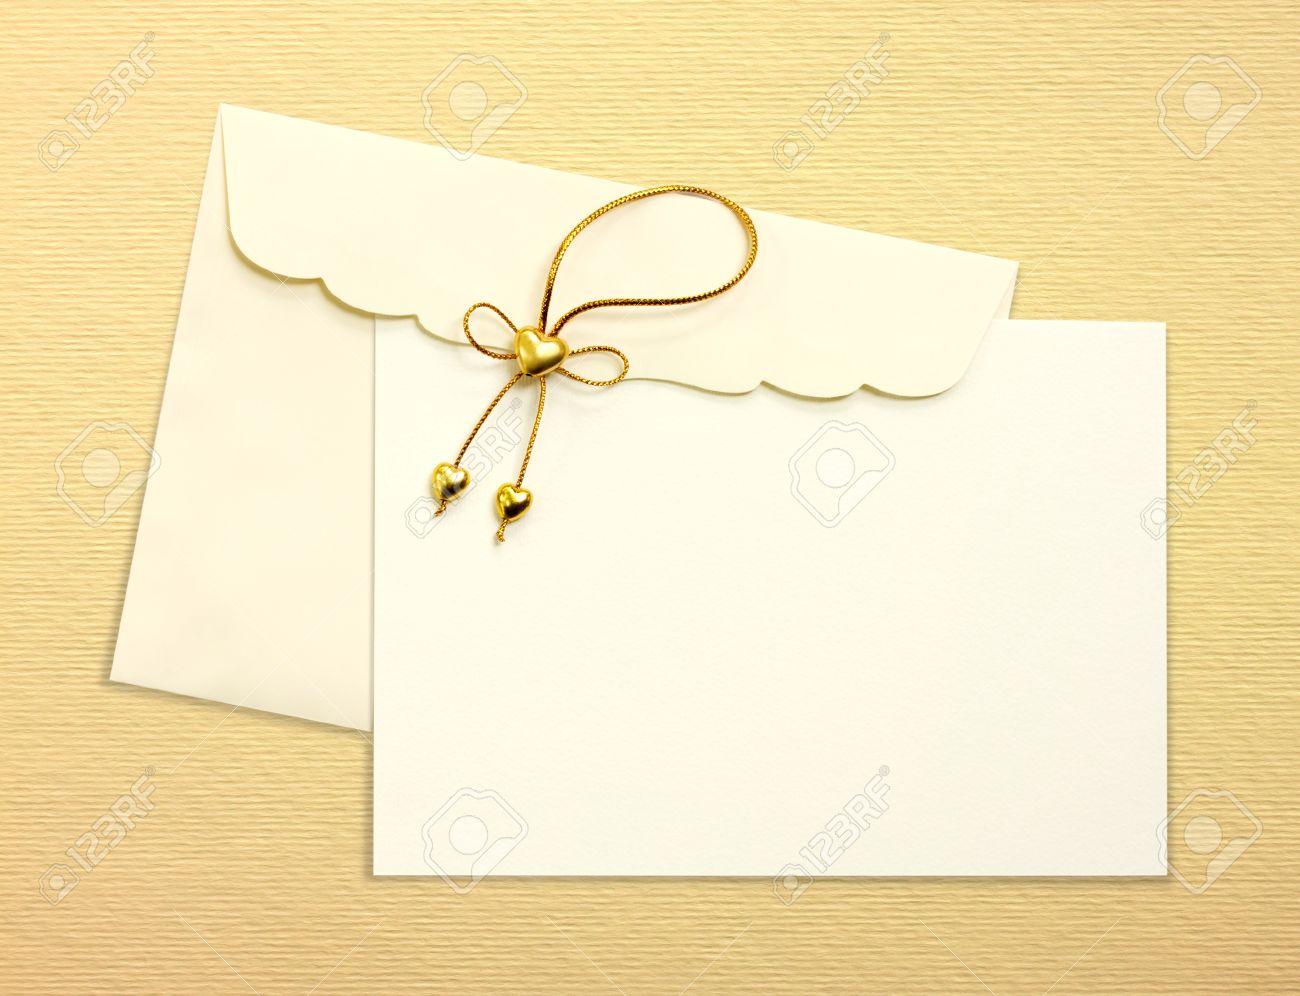 Classy Mail Wedding Gen On Yellow Wedding Invitation Envelopes 6x9 Wedding Invitation Envelopes Sizes Envelope Mail Wedding Gen On Yellow Backgroundstock Photo Envelope wedding invitation Wedding Invitation Envelopes